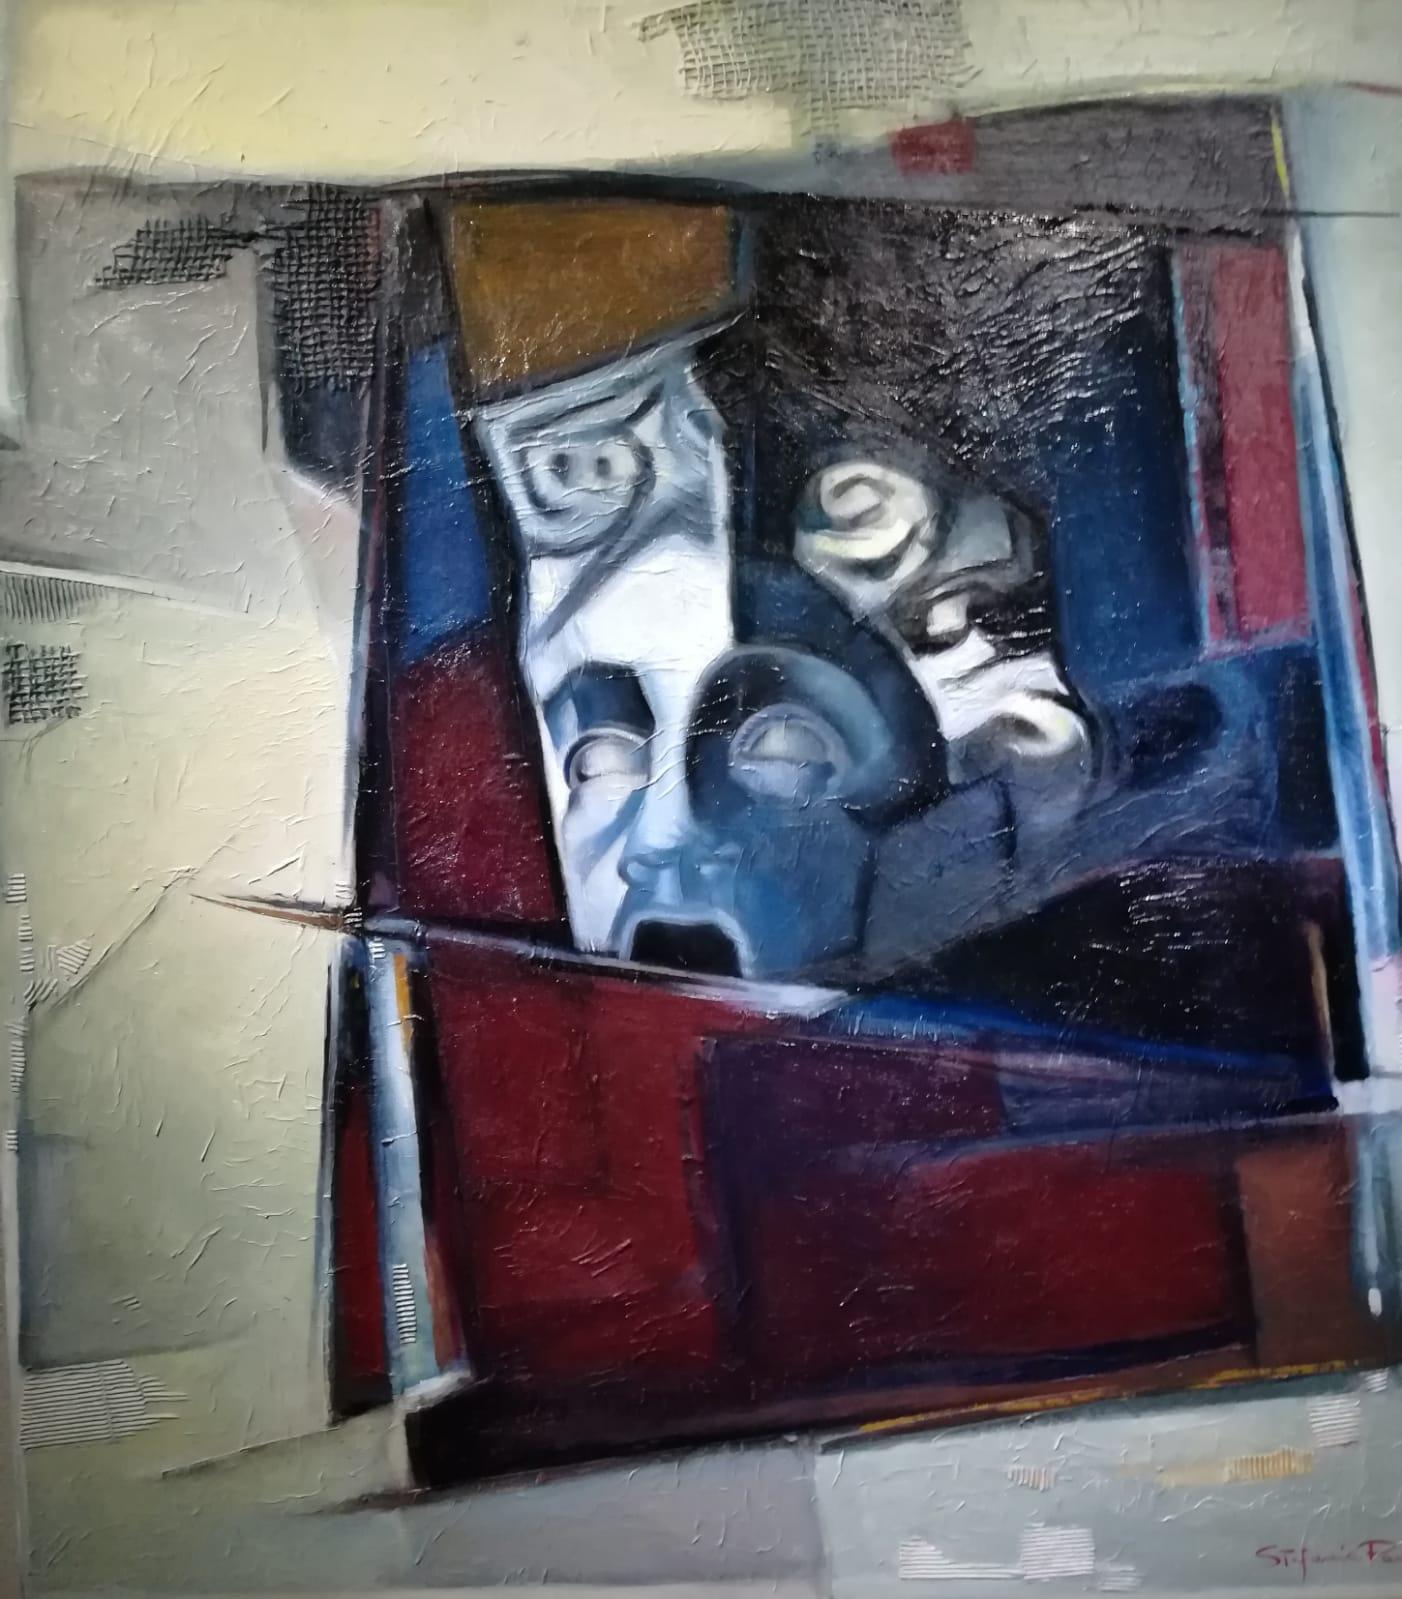 Maschera, Vita, Emozioni di Stefania Panelli